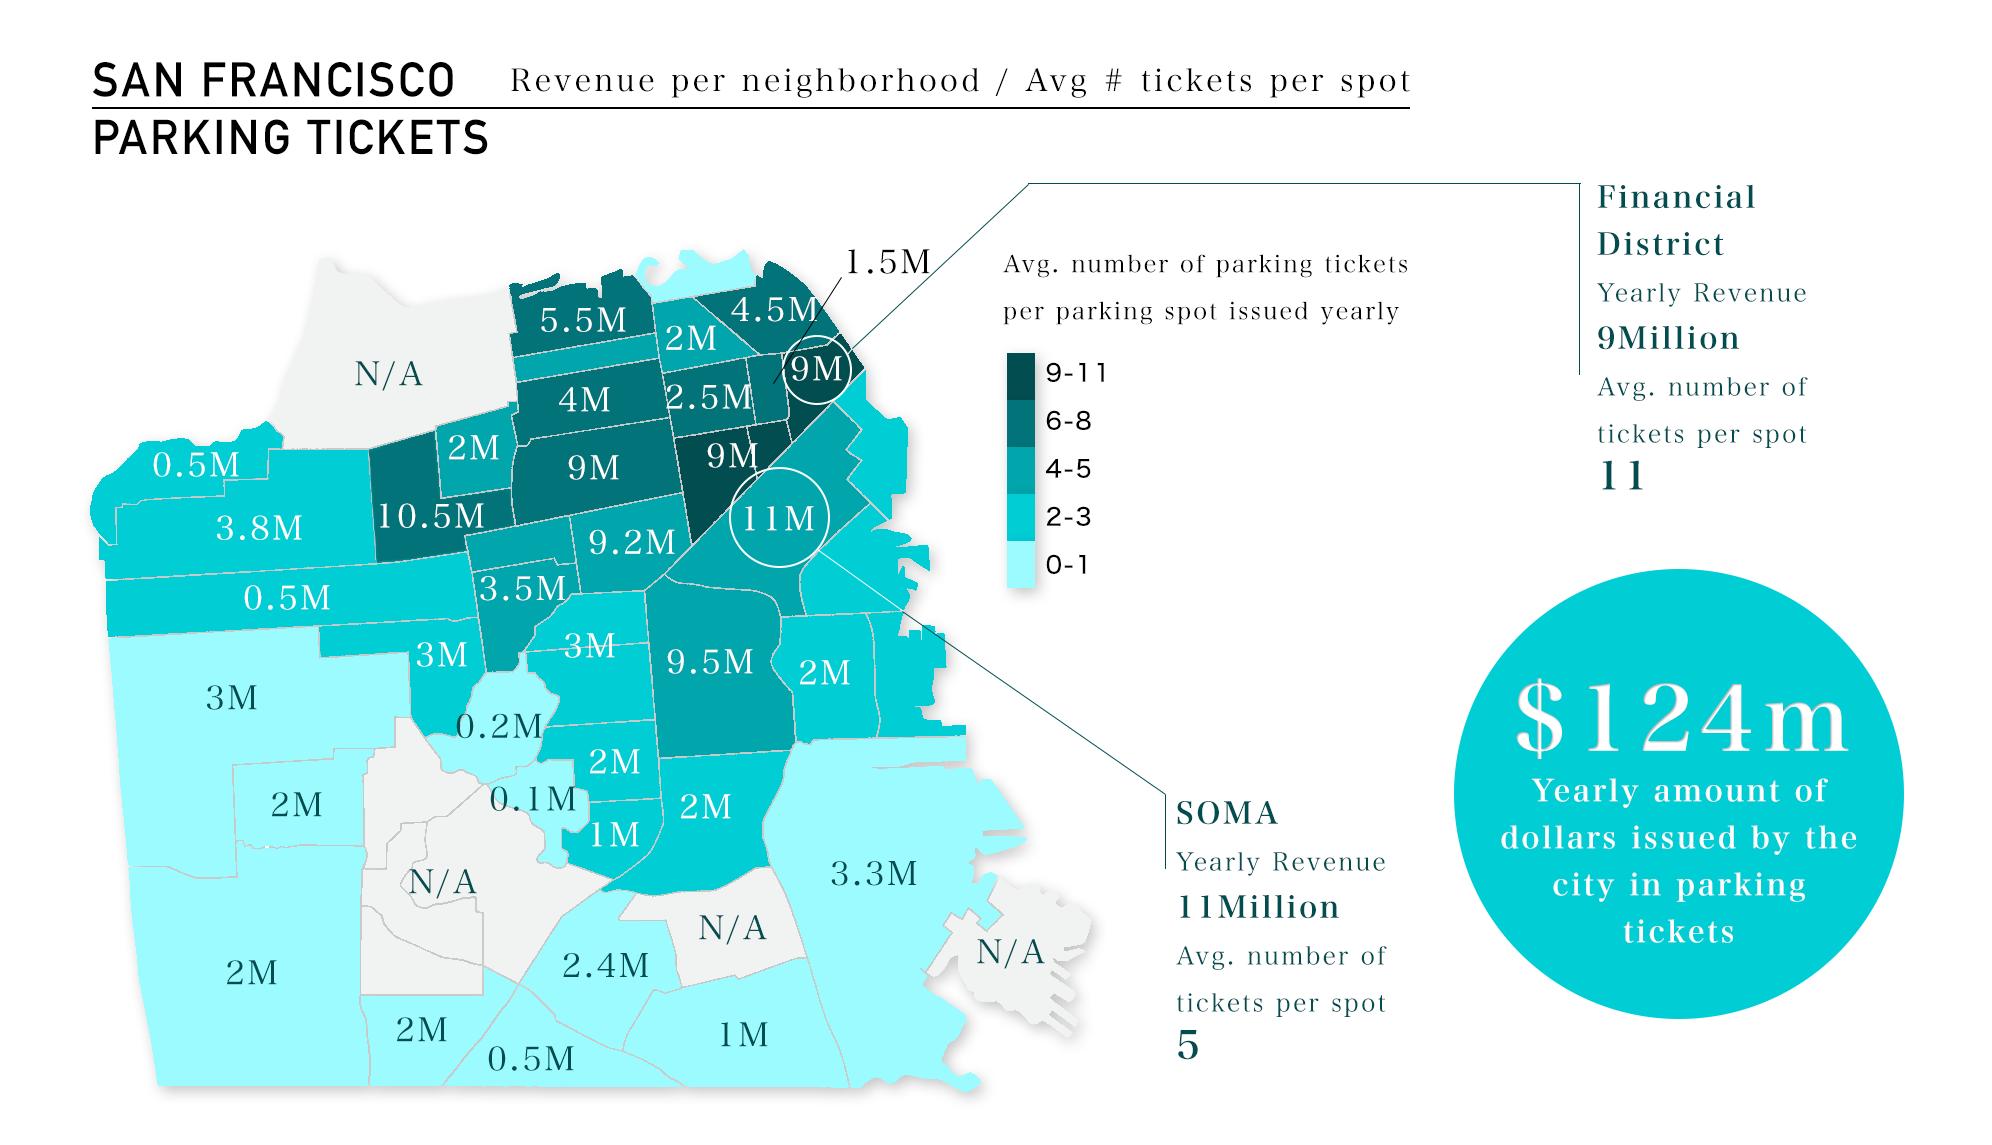 sf parking tickets by neighborhood